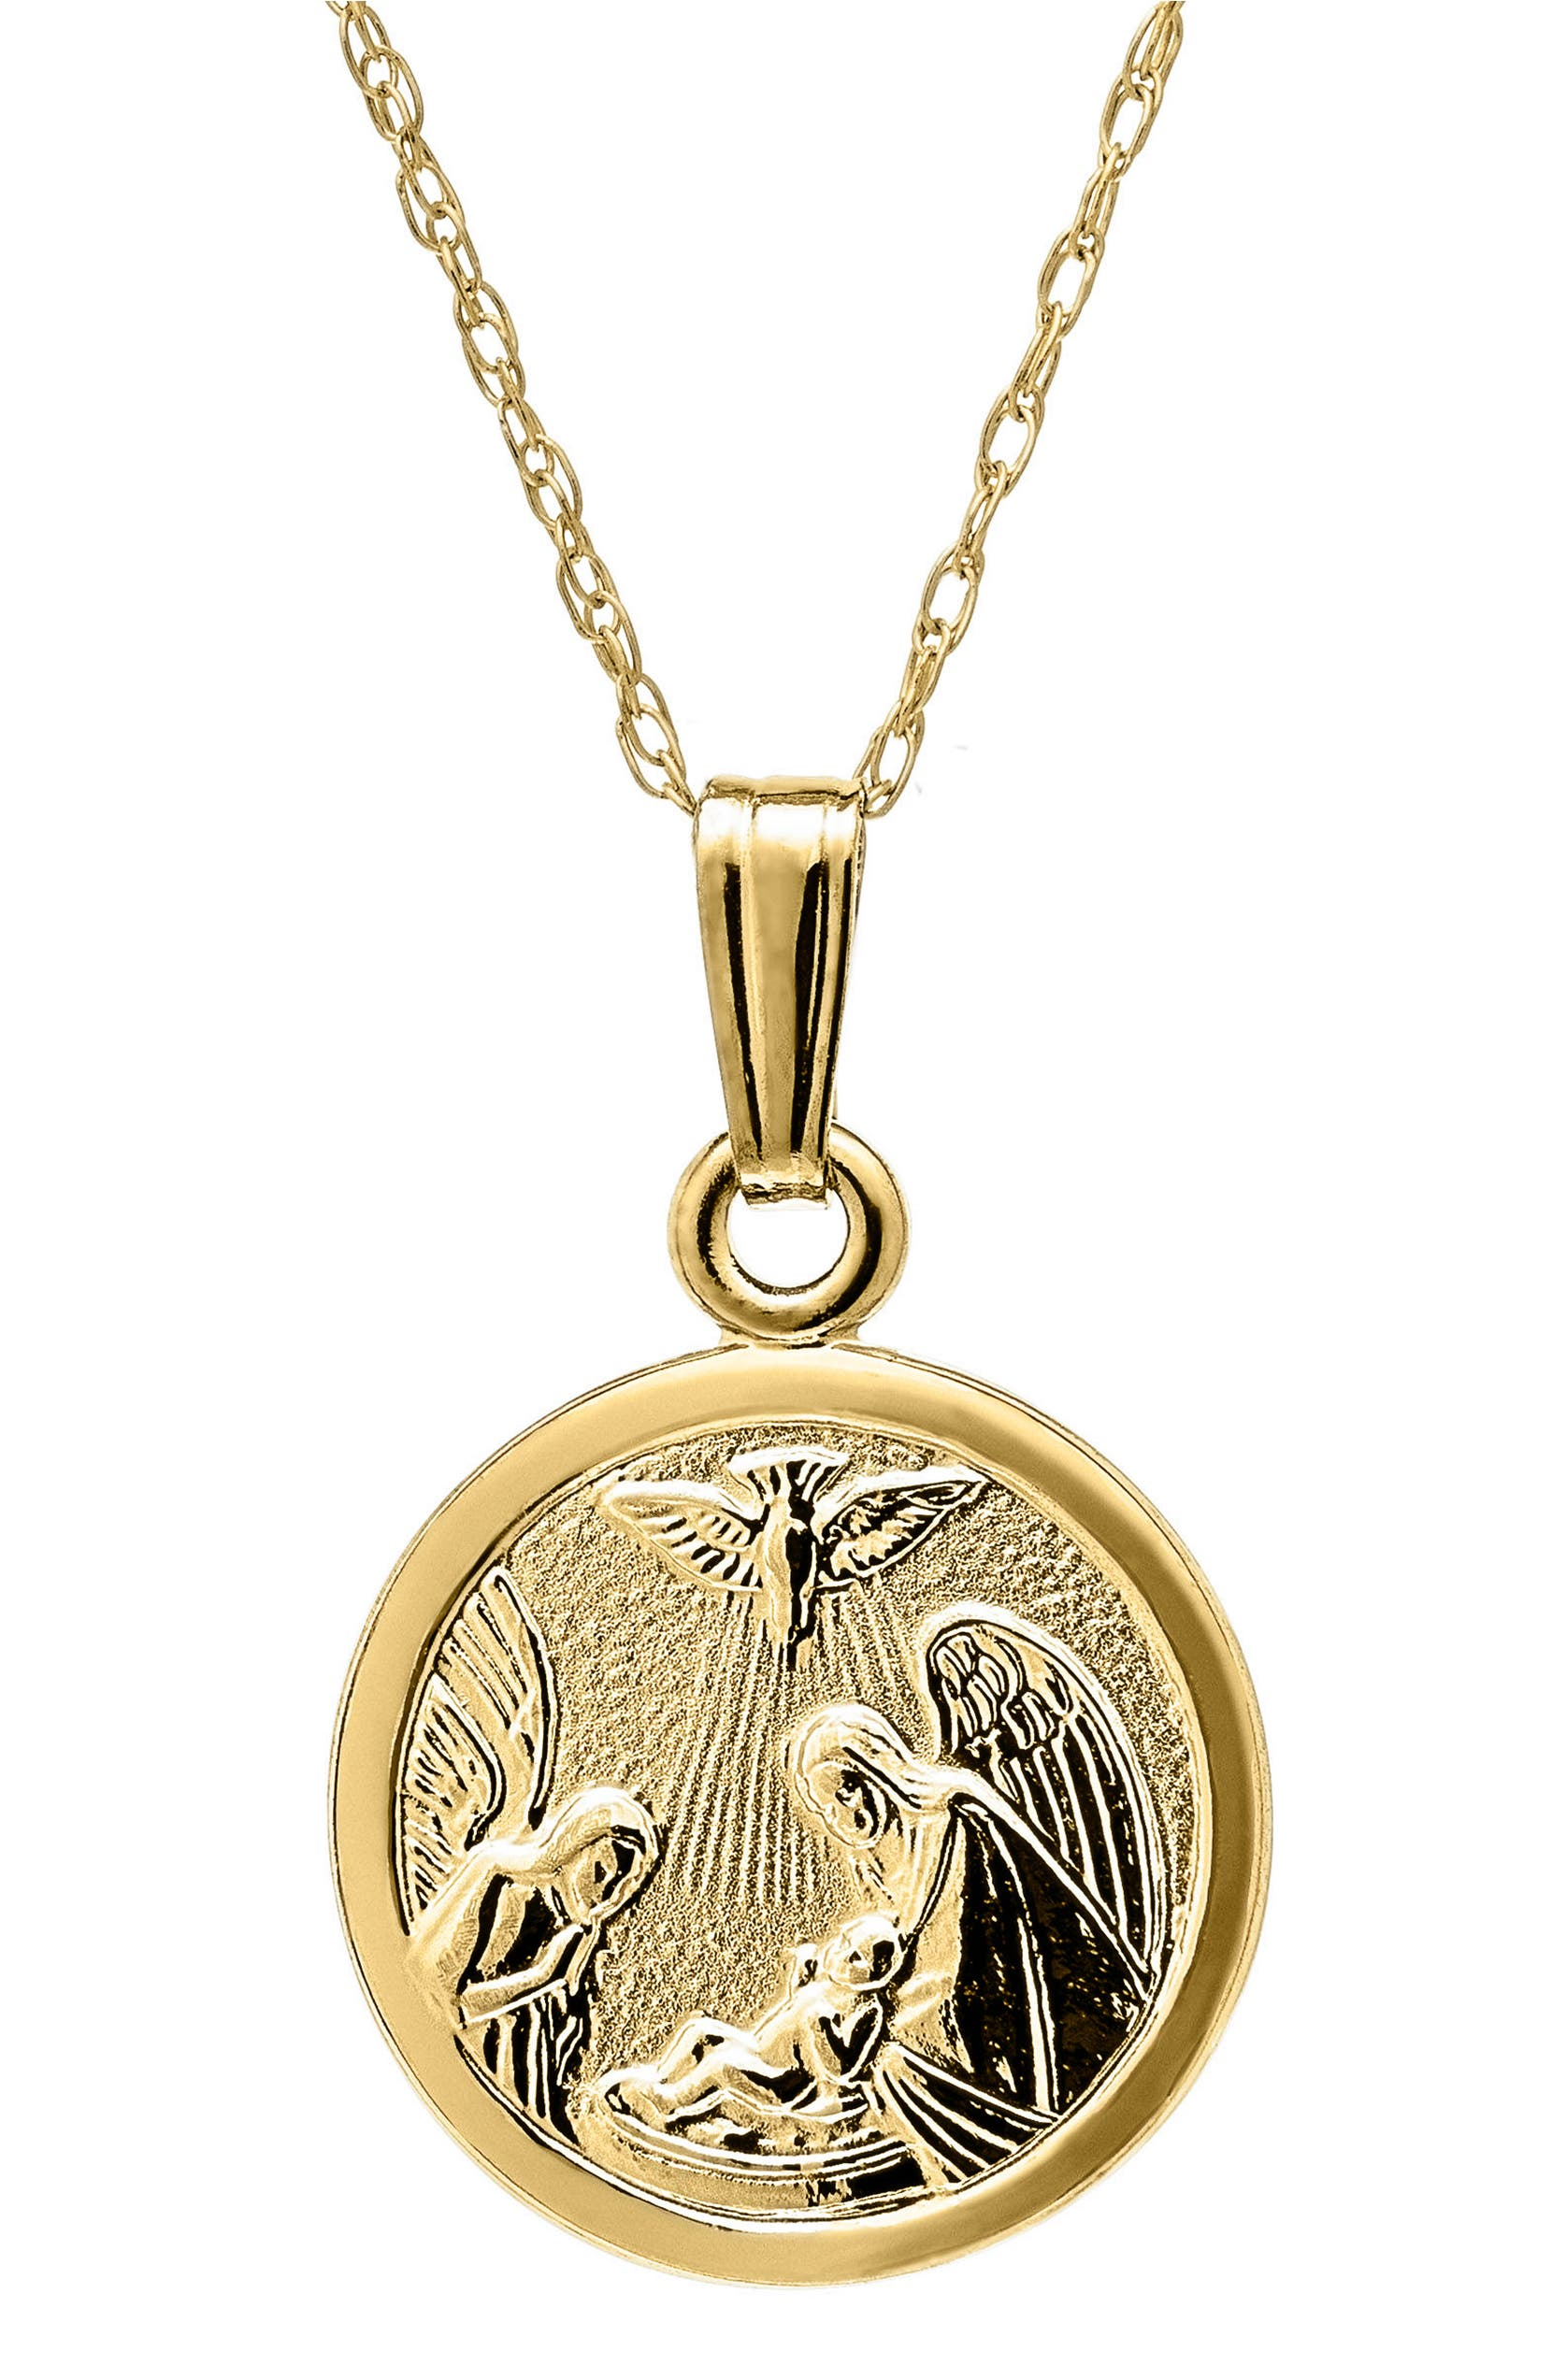 b93ceaae2c2e9 14k Gold Guardian Angel Pendant Necklace